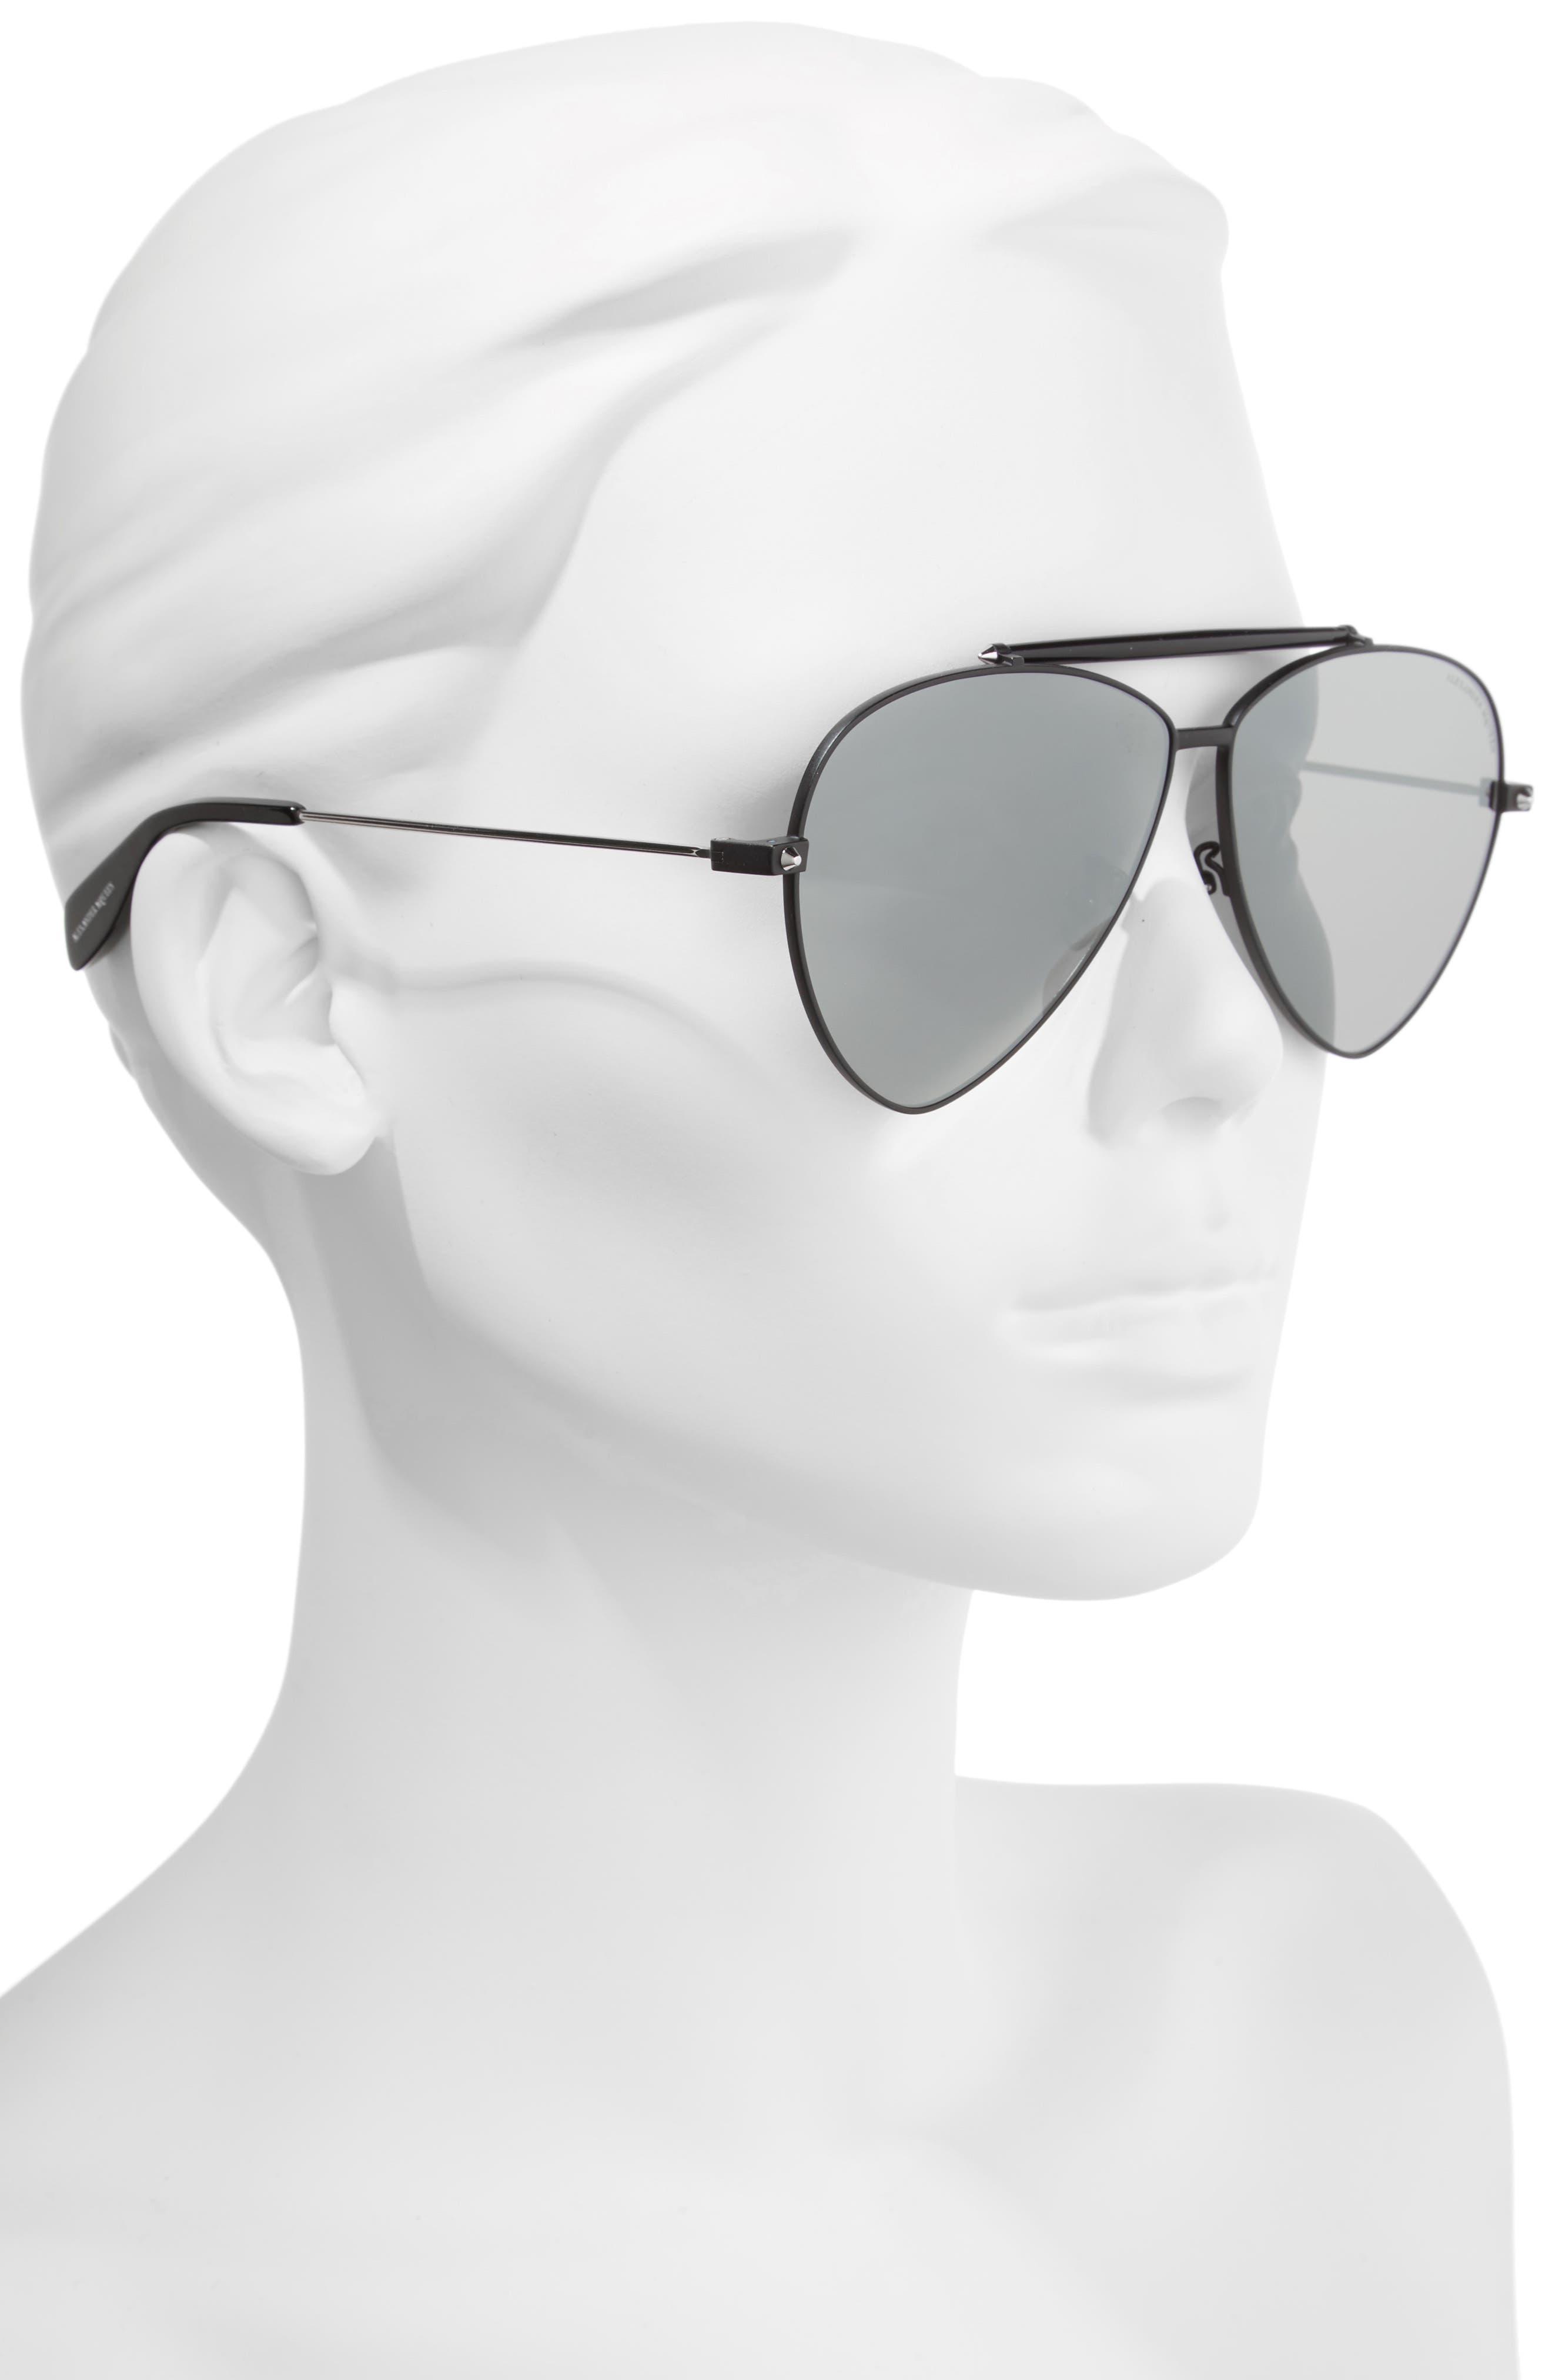 63mm Oversize Aviator Sunglasses,                             Alternate thumbnail 3, color,